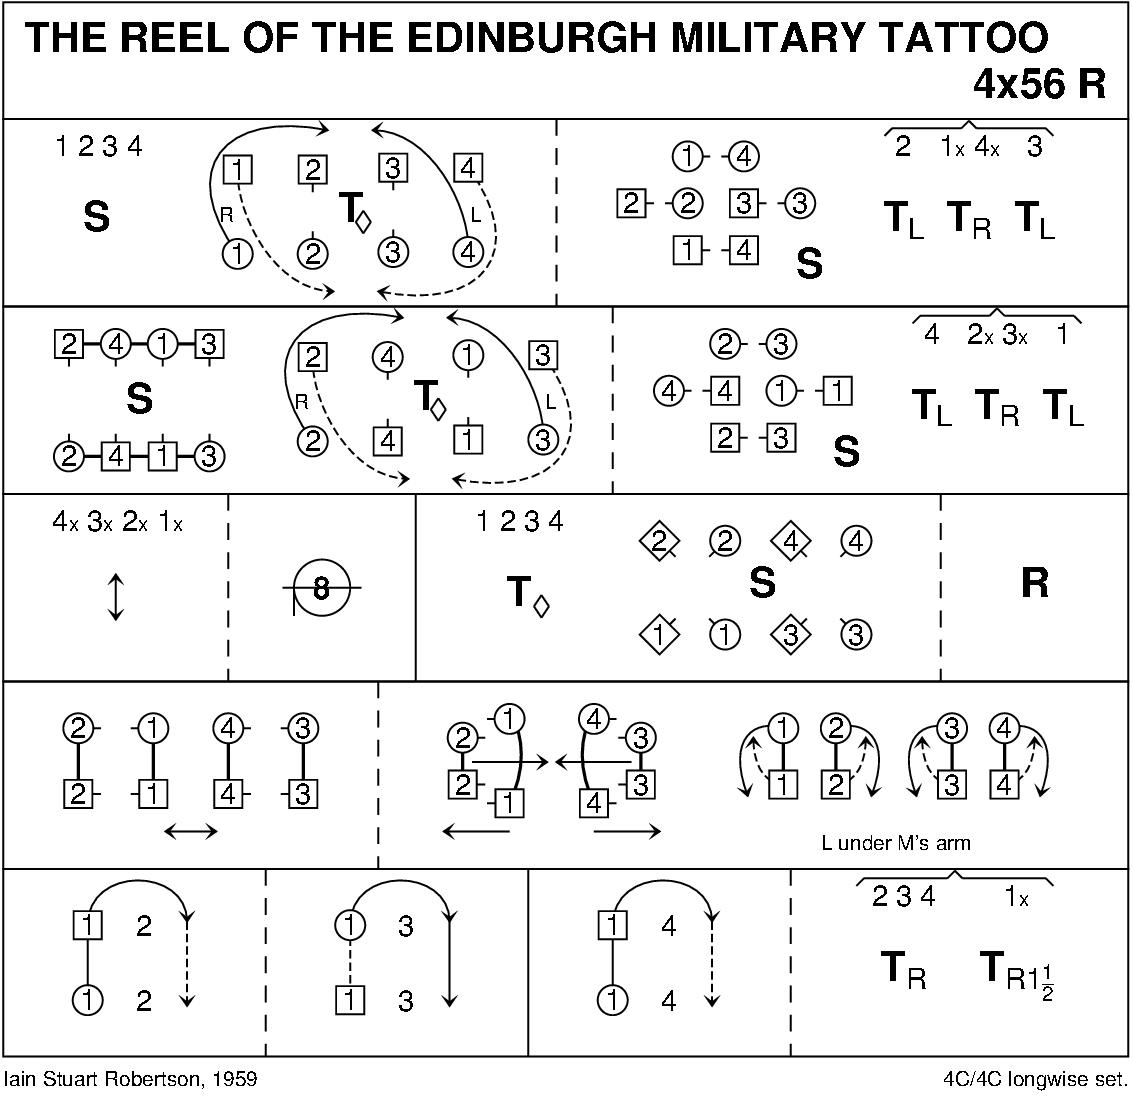 The Reel Of The Edinburgh Military Tattoo Keith Rose's Diagram